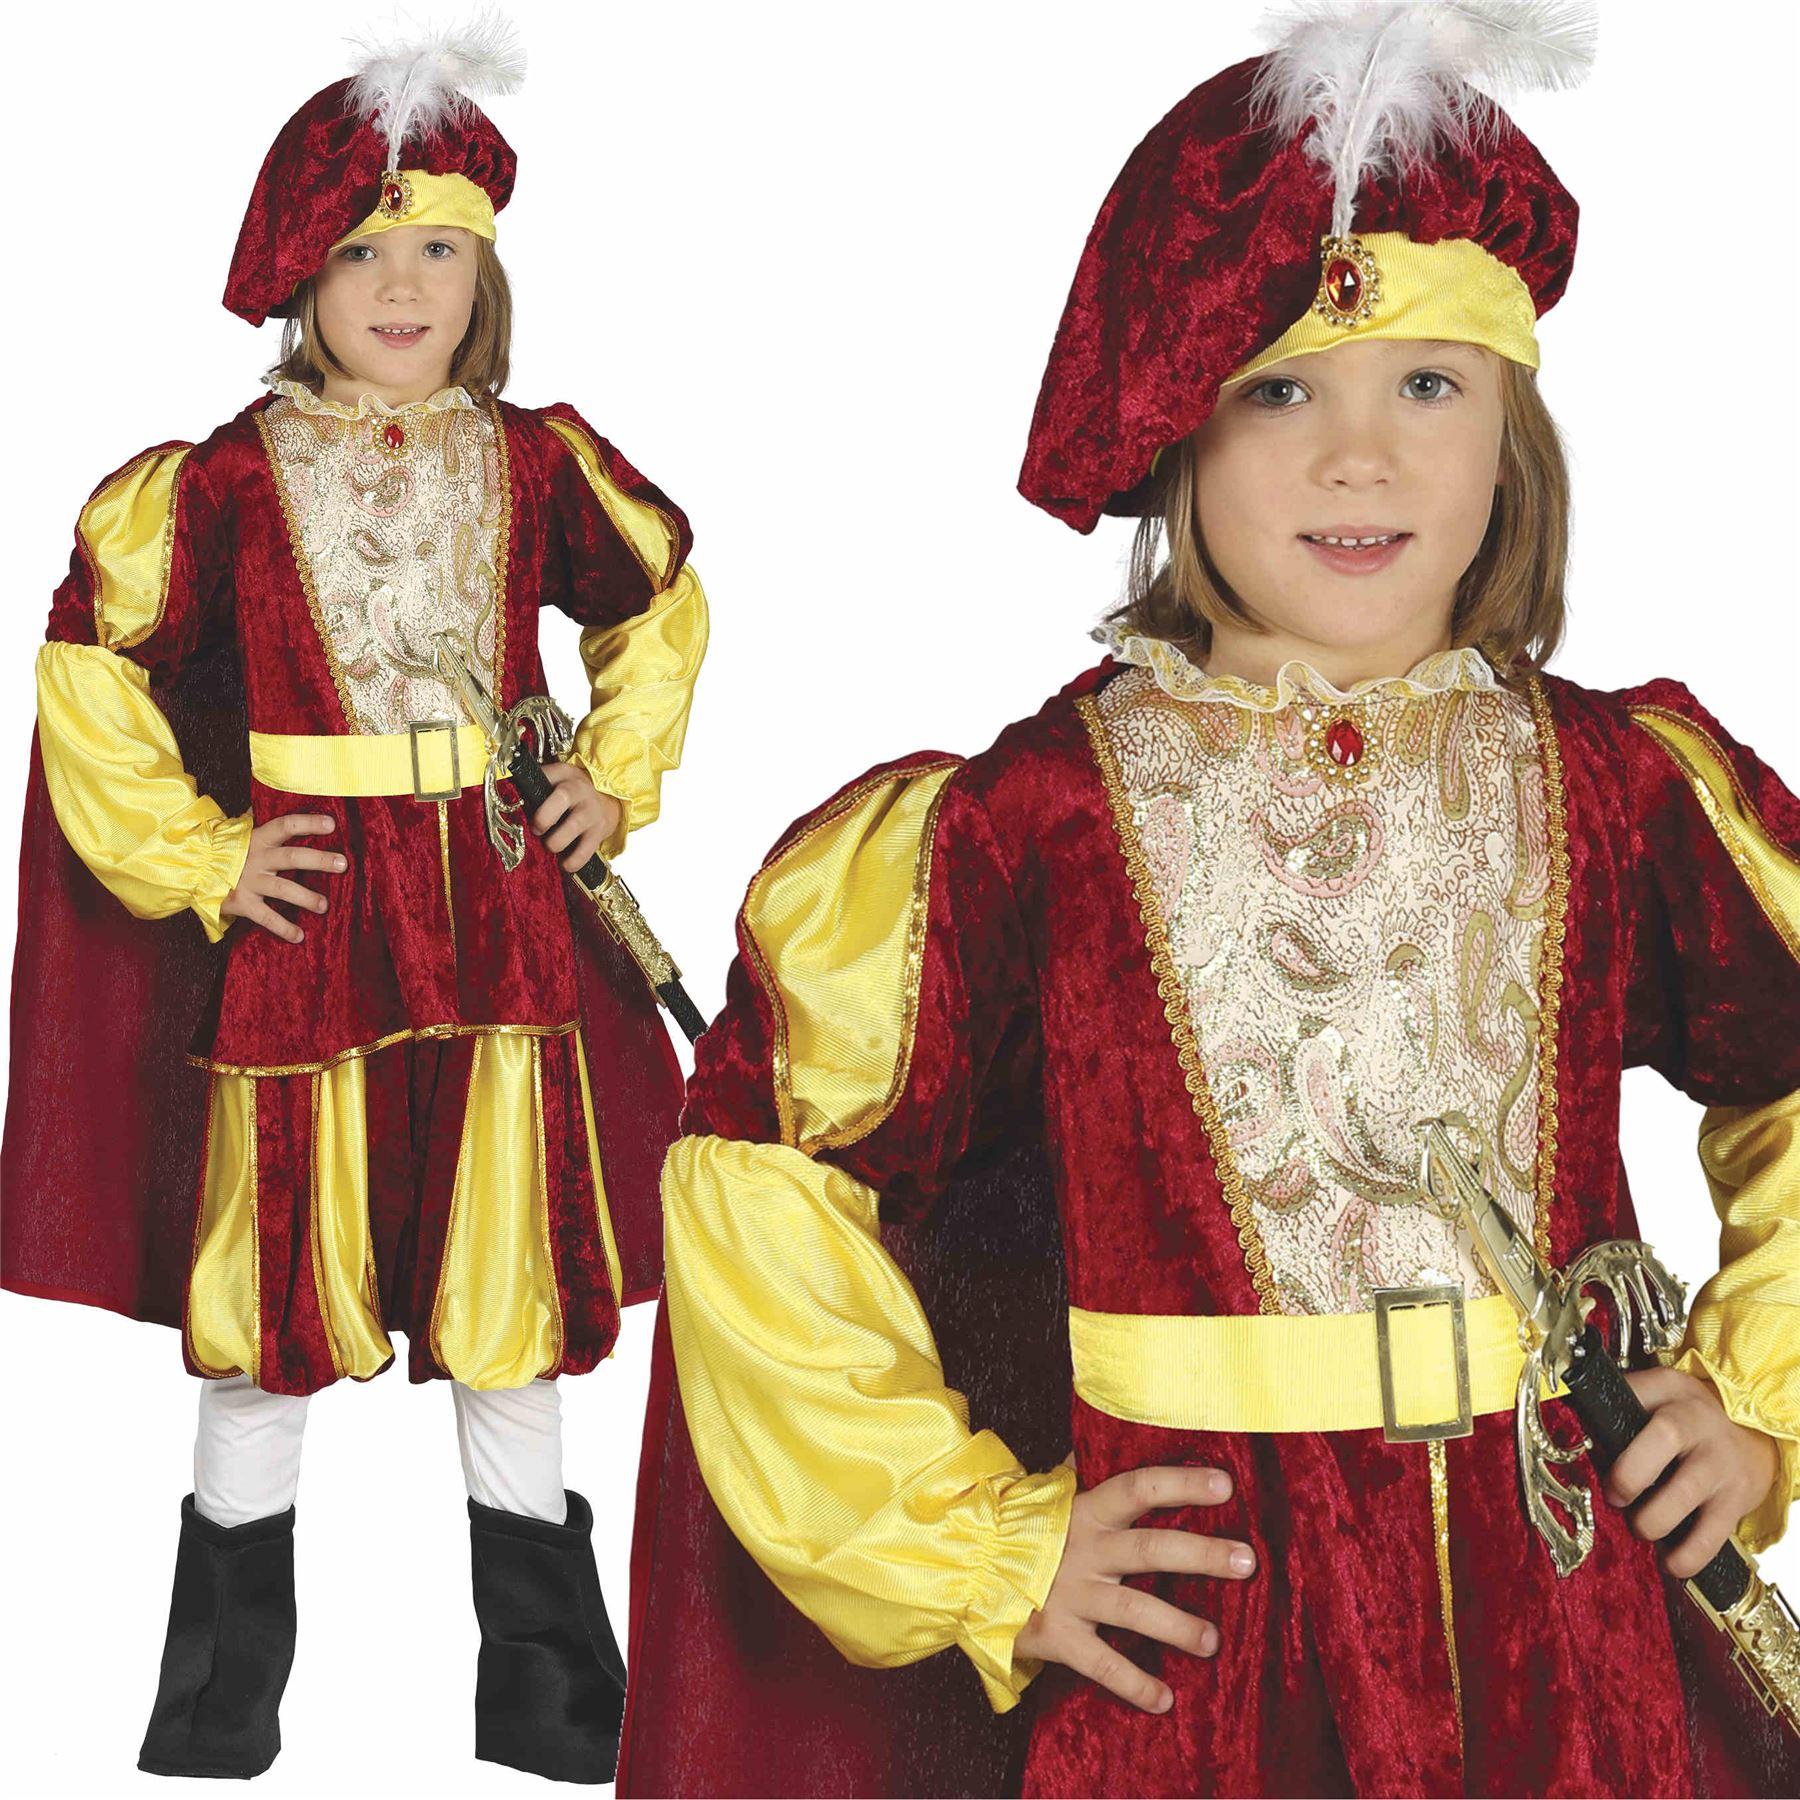 Adult Black/Gold Renaissance Prince Costume - Candy Apple